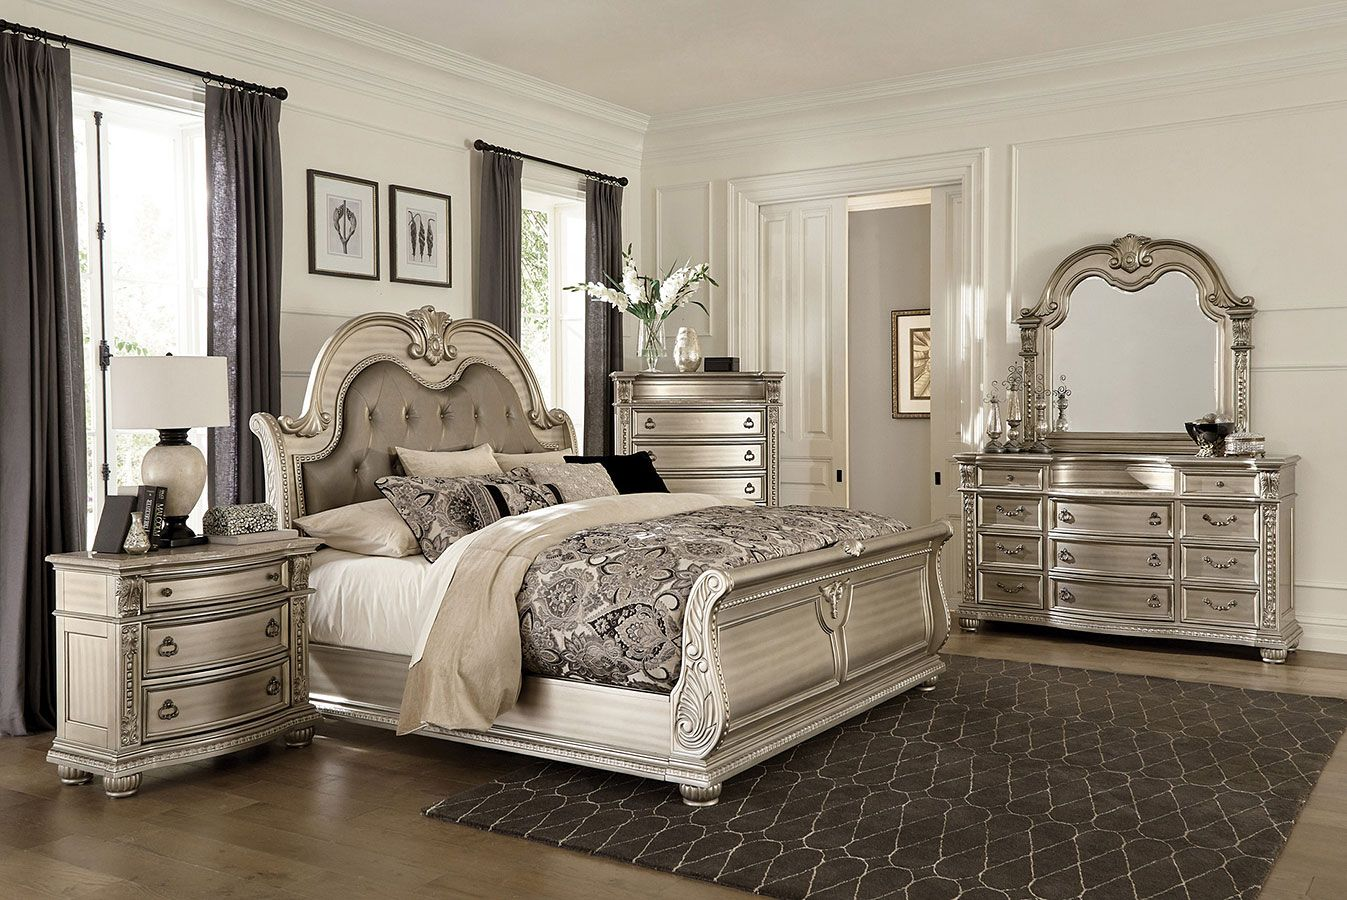 Cavalier Sleigh Bedroom Set (Silver)   Sleigh bedroom set, Bedroom set, Bedroom sets queen